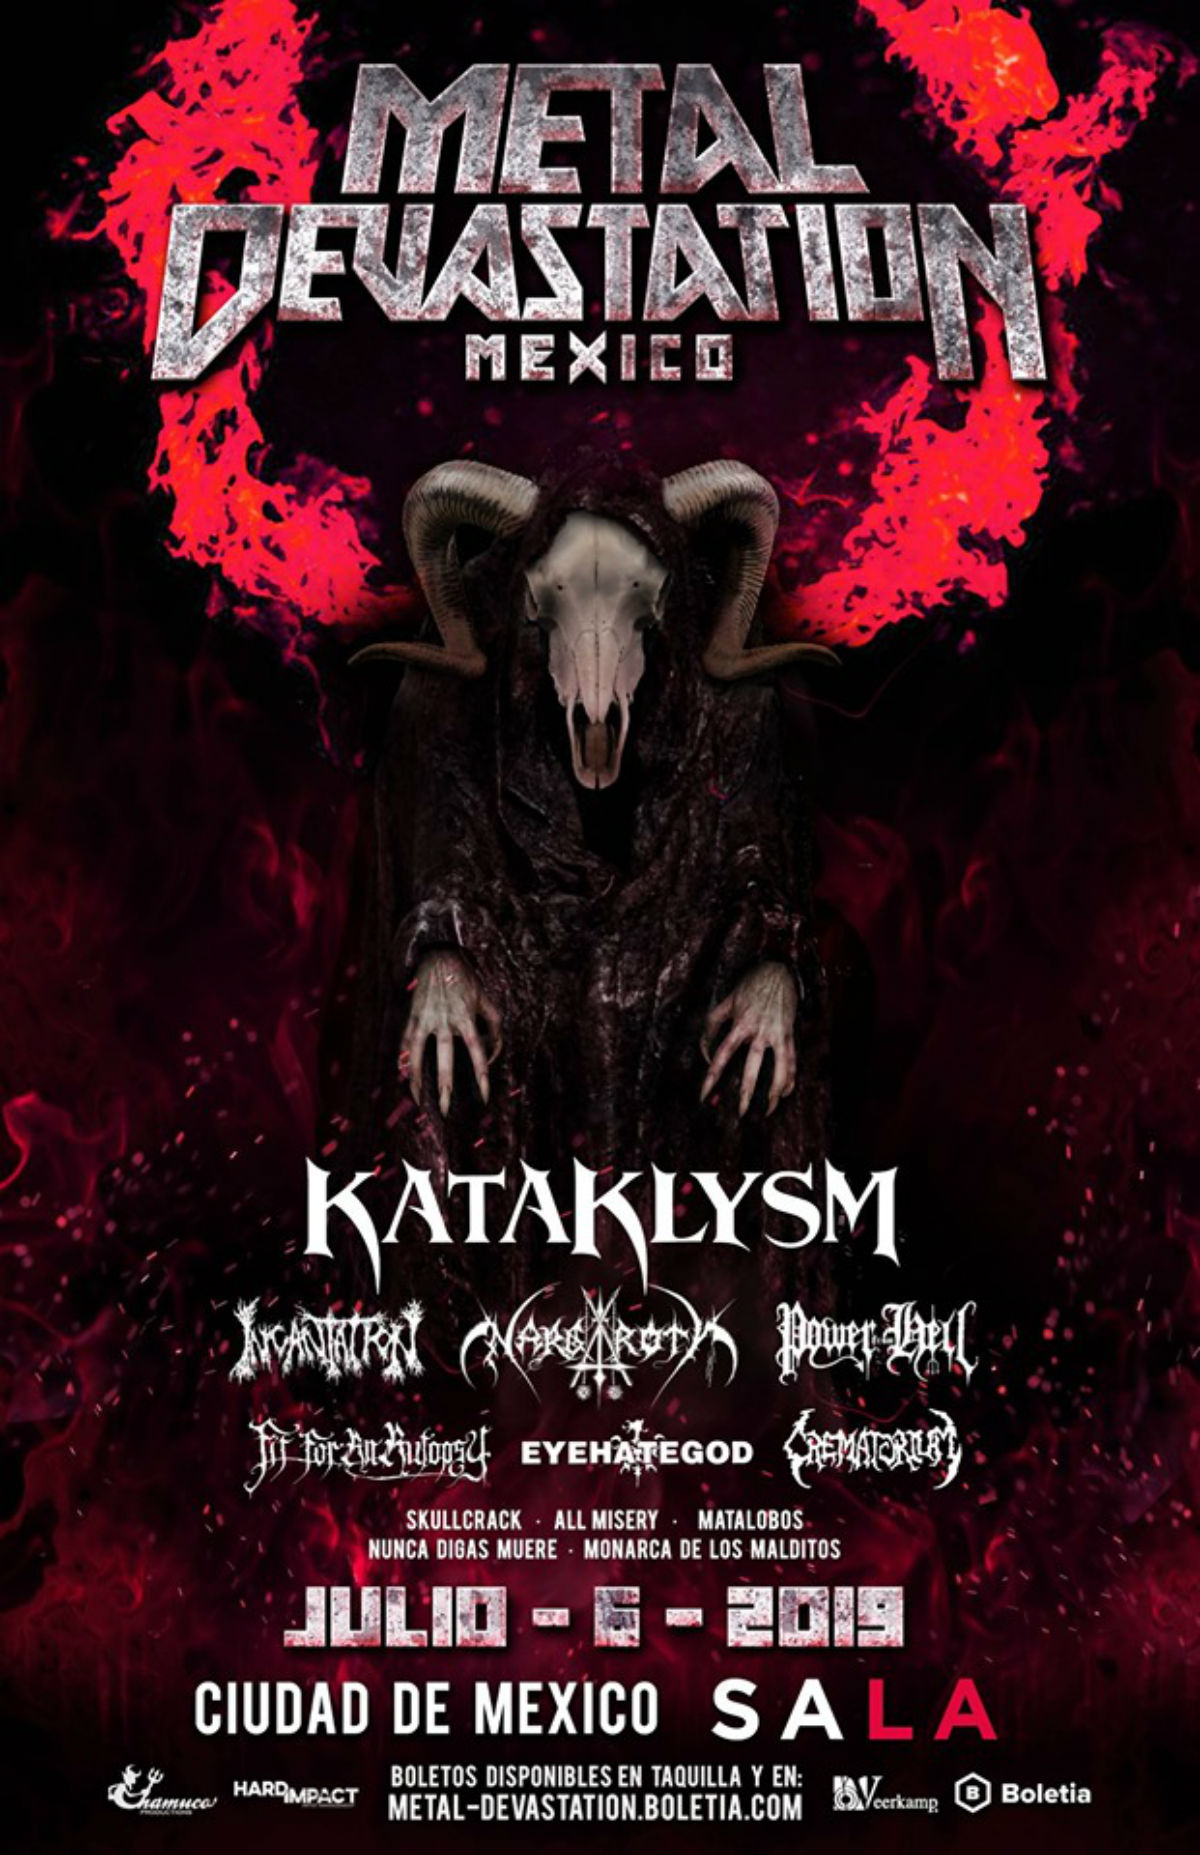 metal devastation fest kataklysn festival metal CDMX Meditations Crematorium